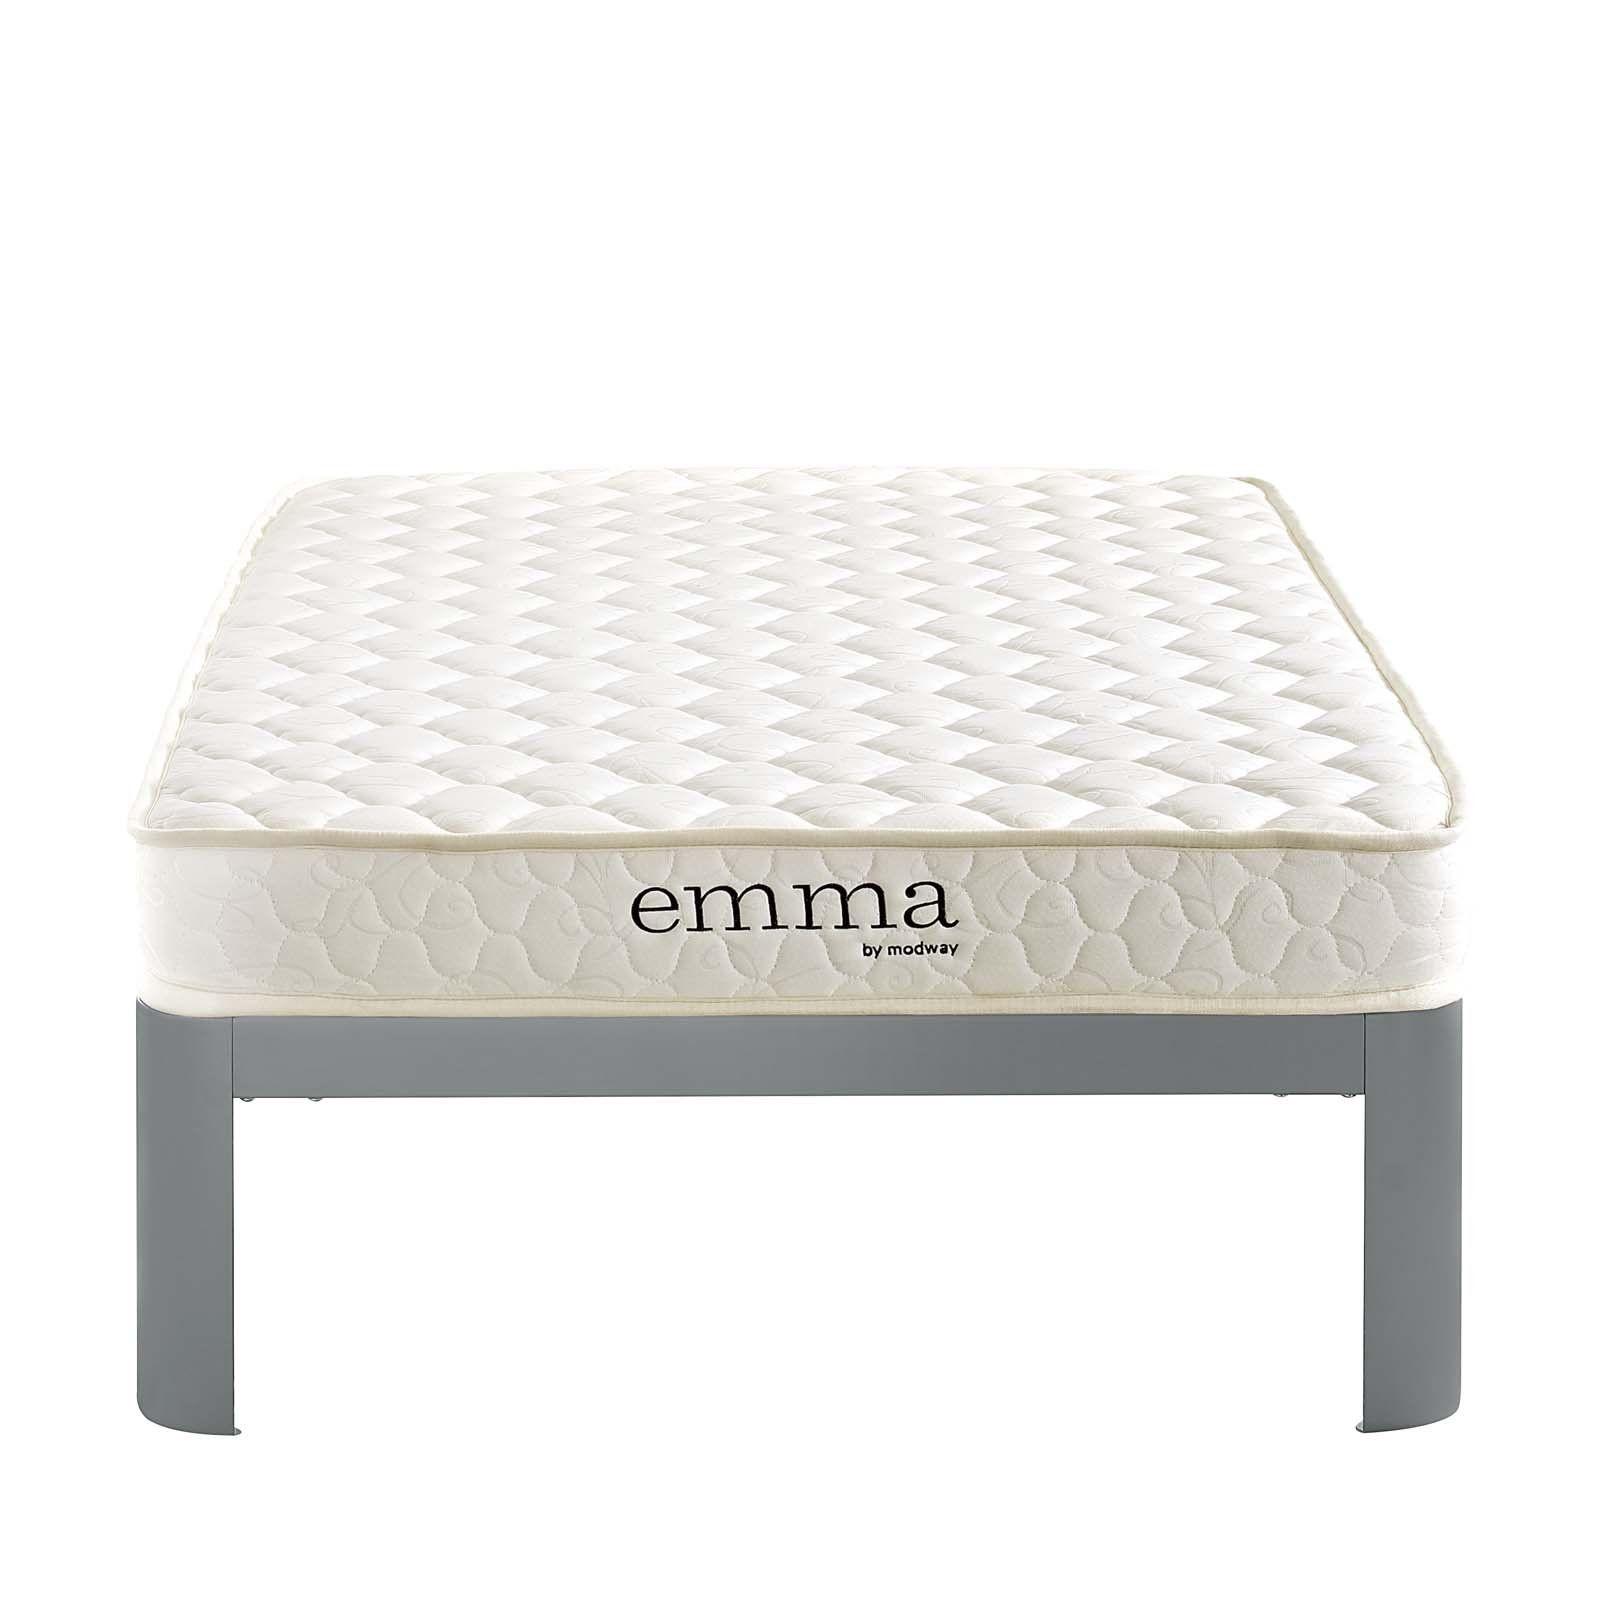 modway furniture modern emma 6 twin xl mattress mod 5732 twin